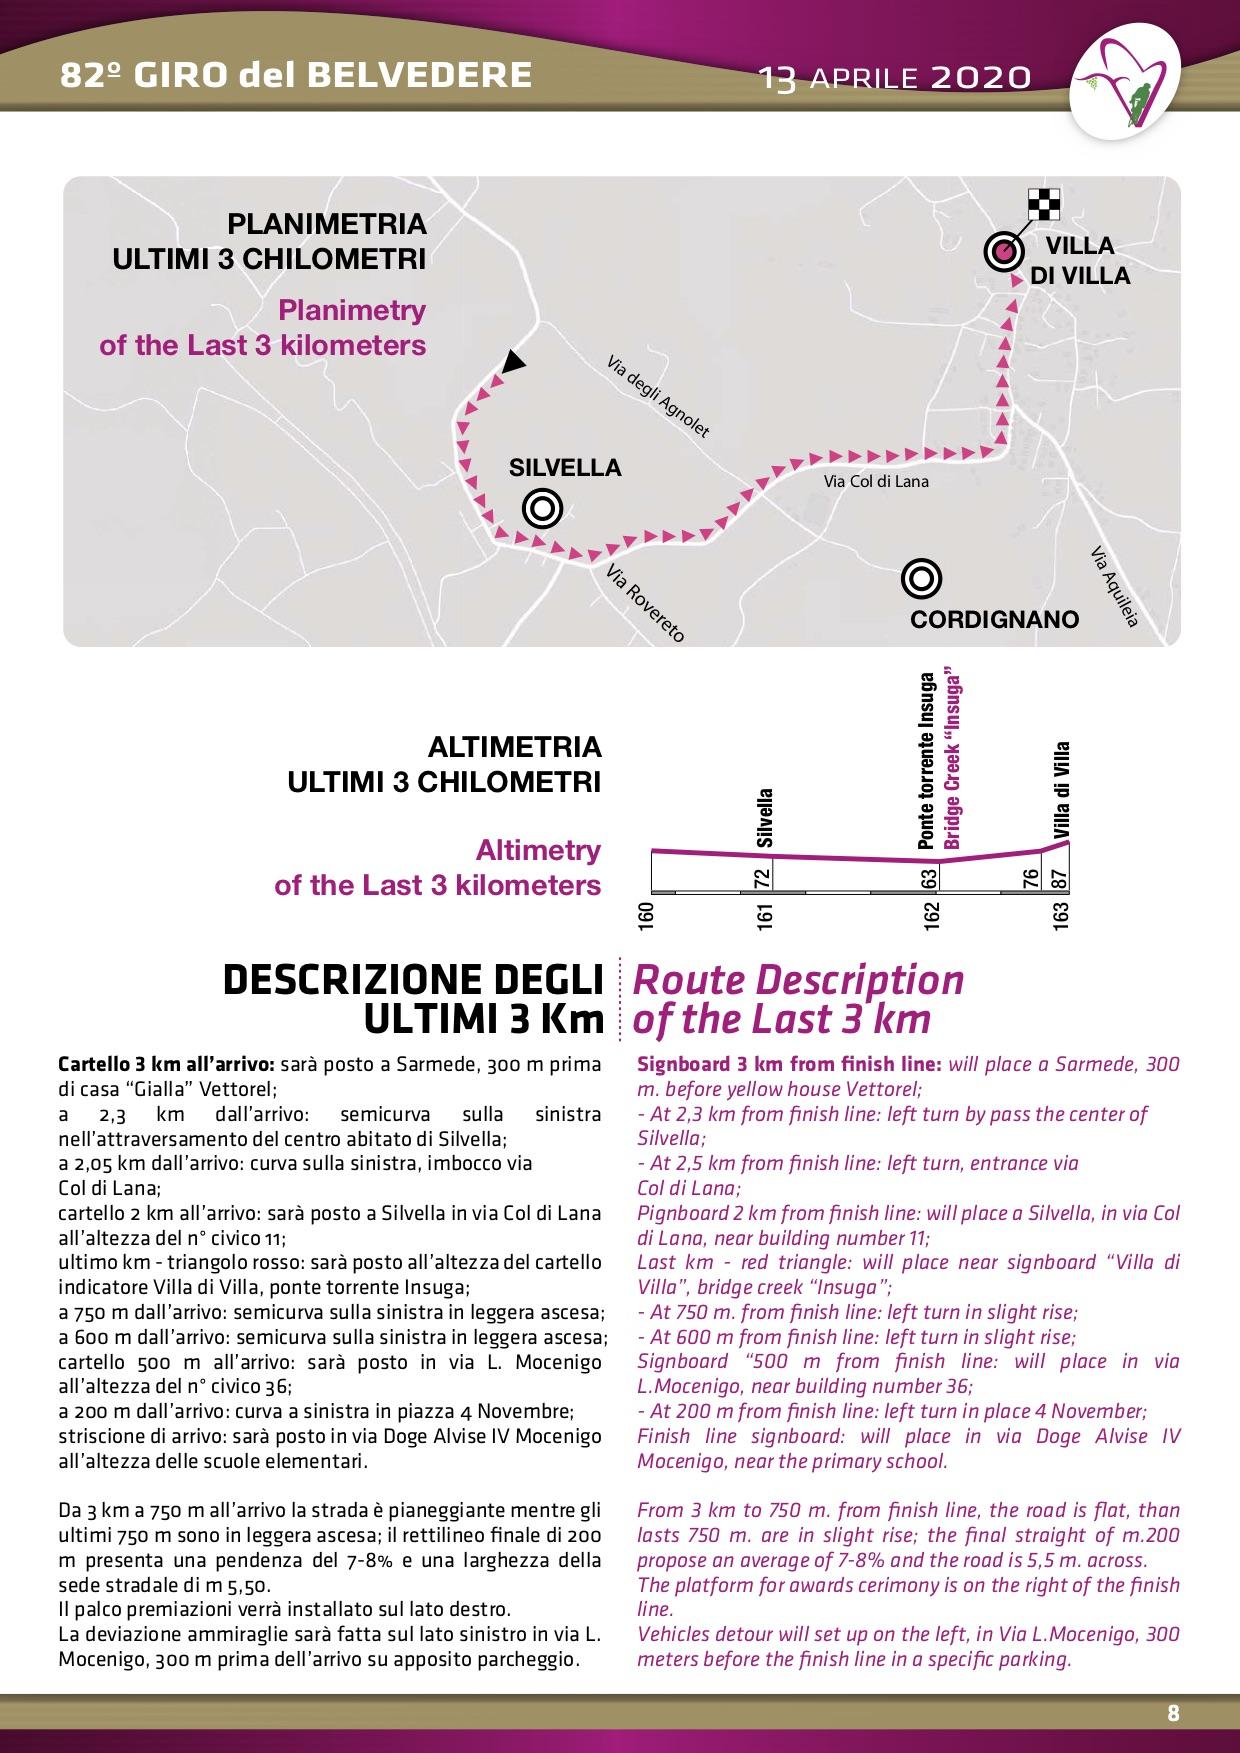 Giro del Belvedere - Planimetria ultimi 3 km 2017